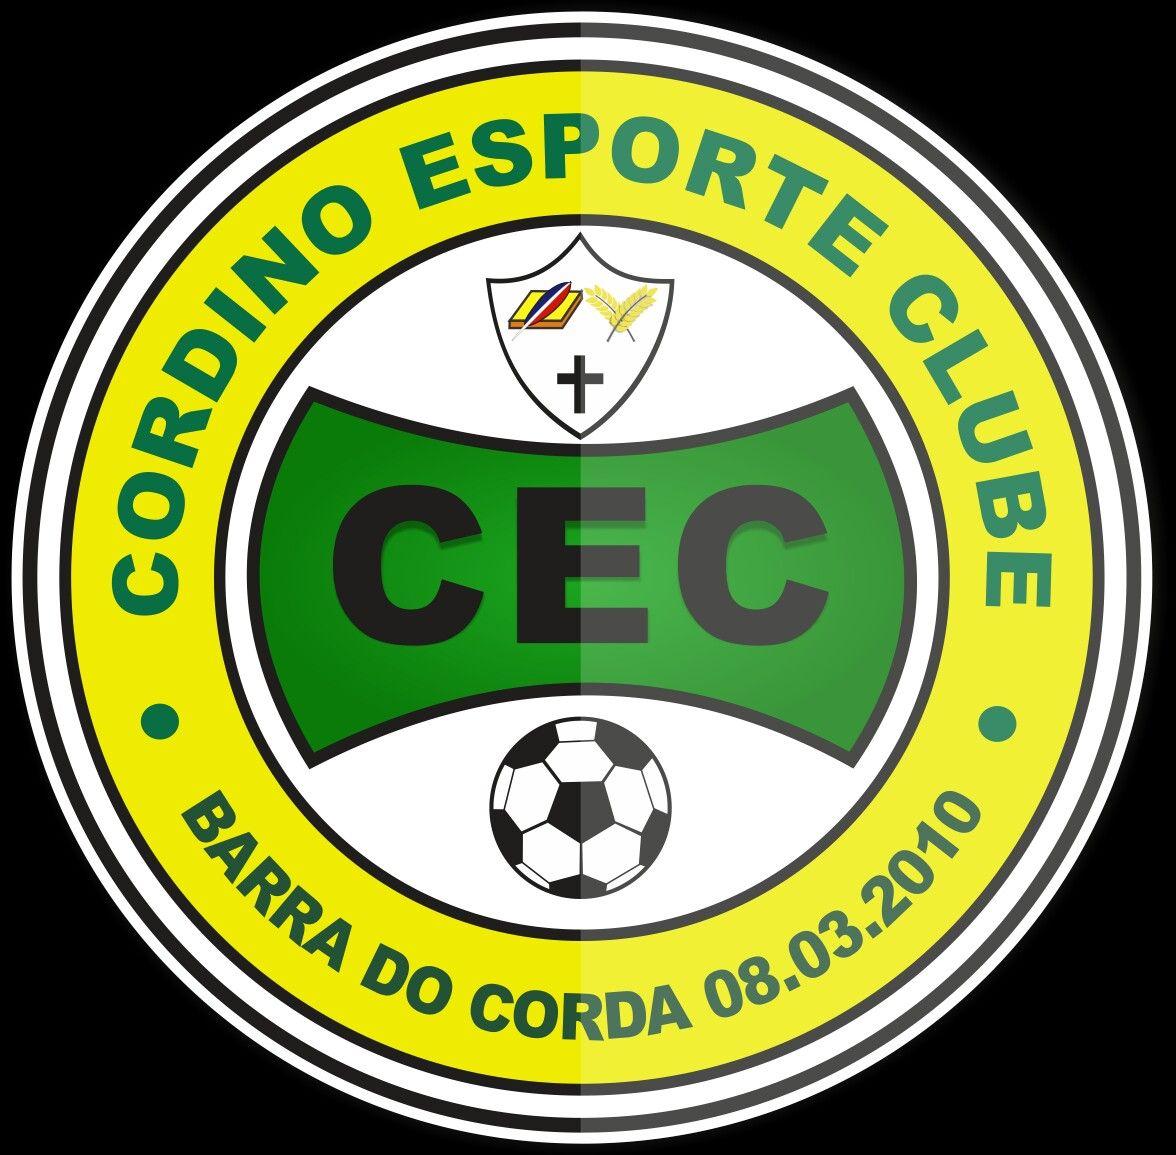 Cordino E.C. Barra do Corda, MA Escudos de futebol